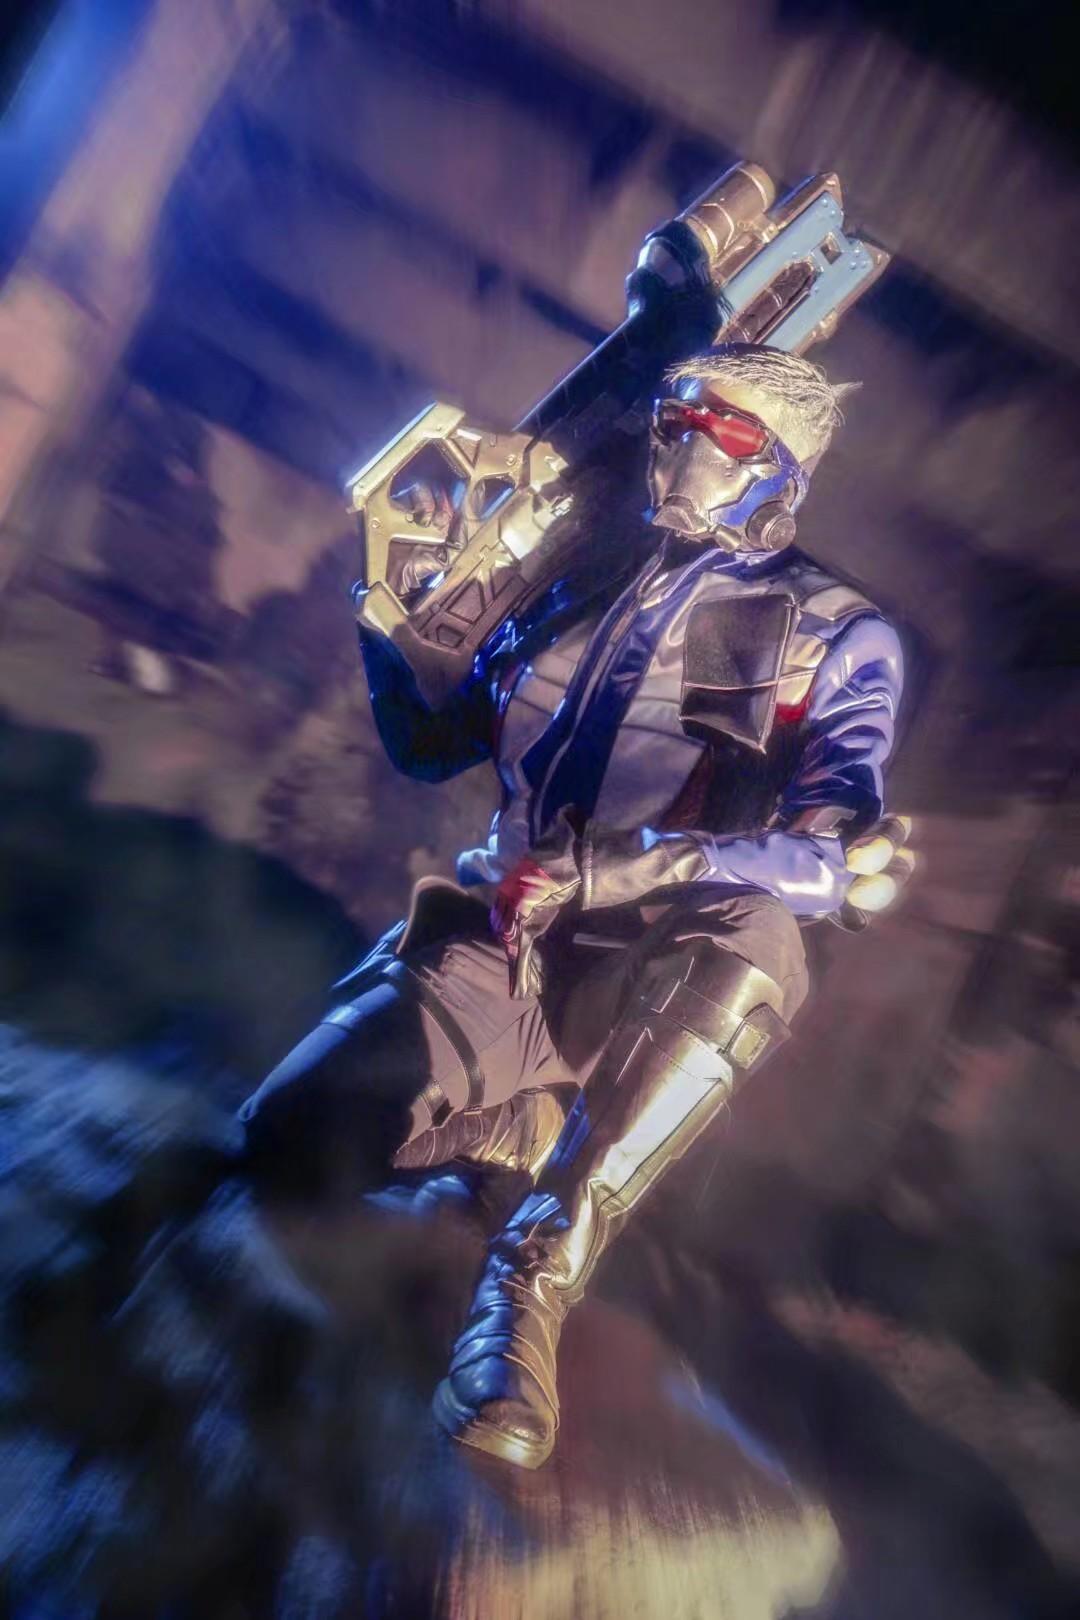 《JOJO的奇妙冒险》守望先锋cosplay【CN:瞎尸】-第5张